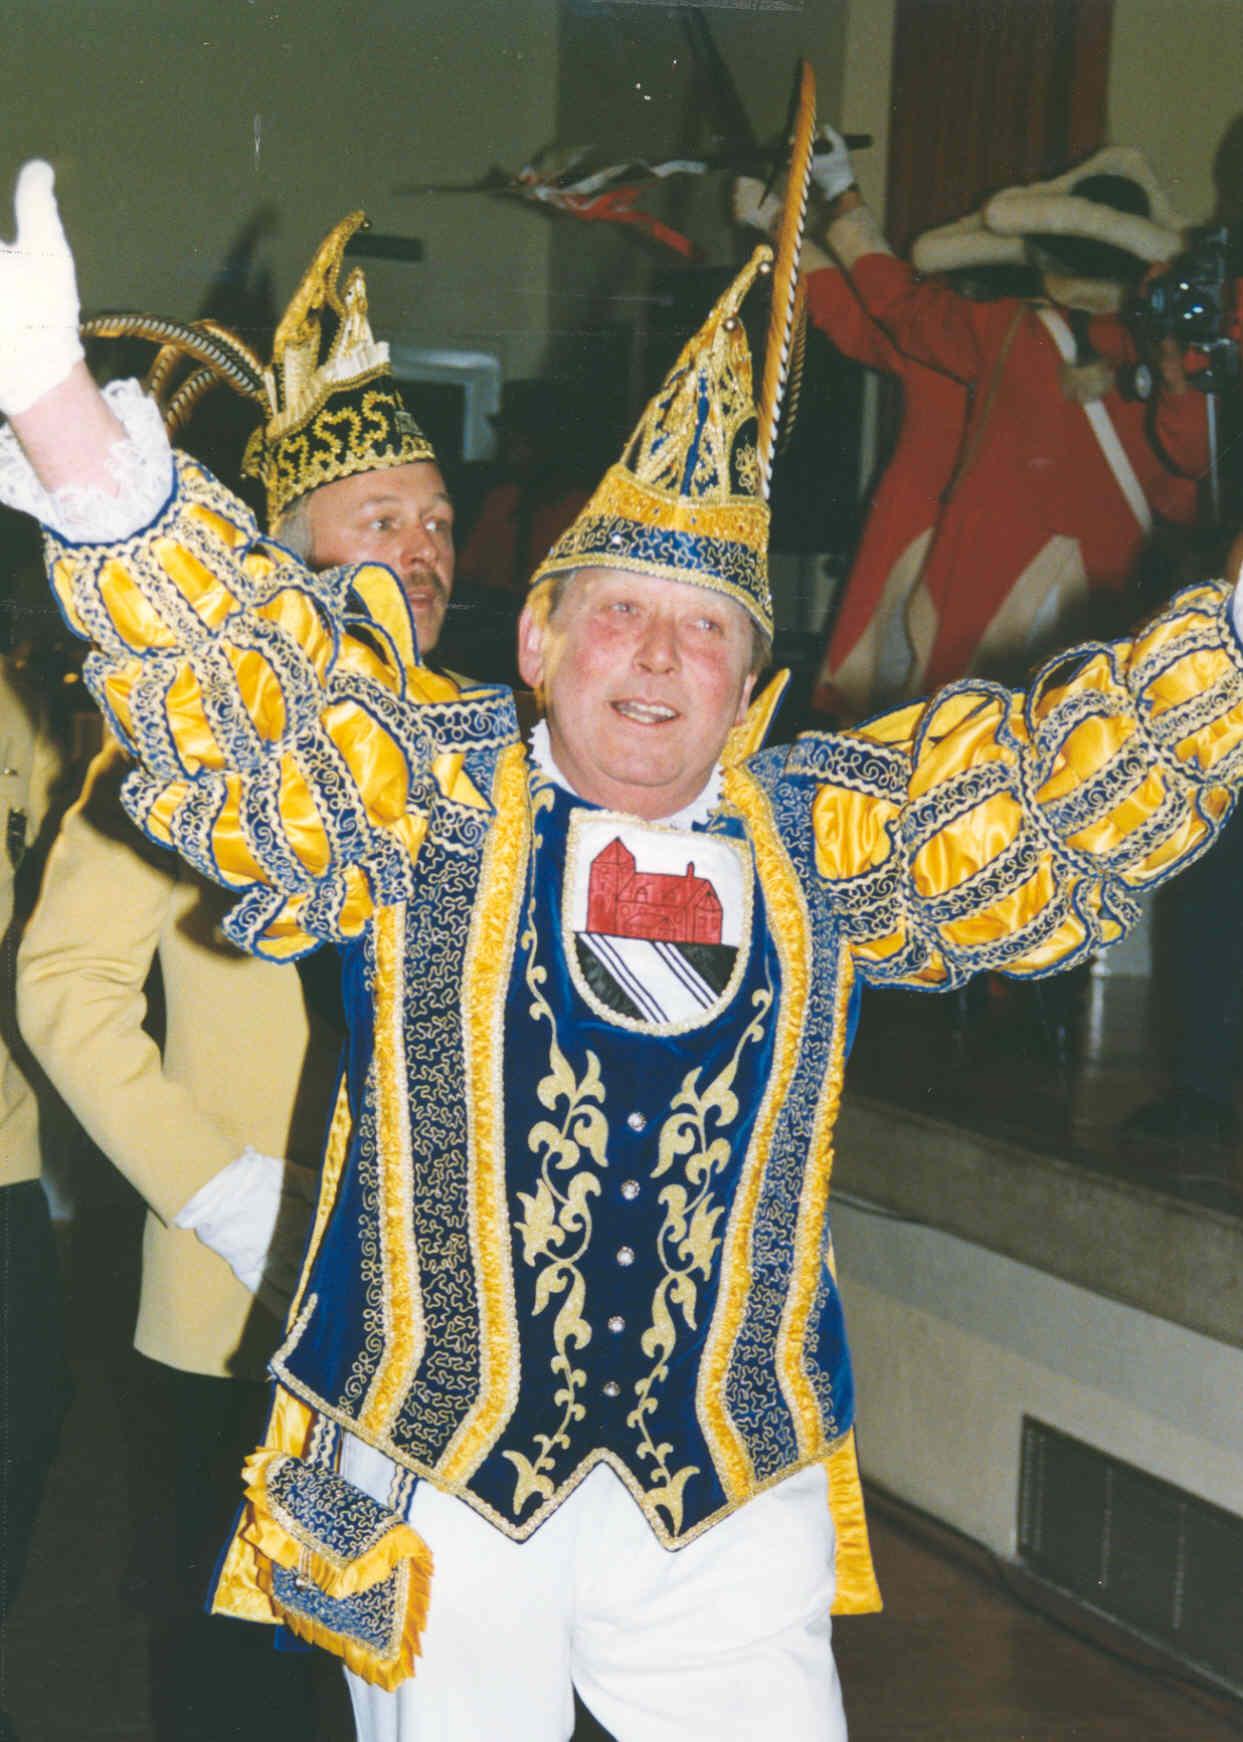 1989-Richard I (Pulte)